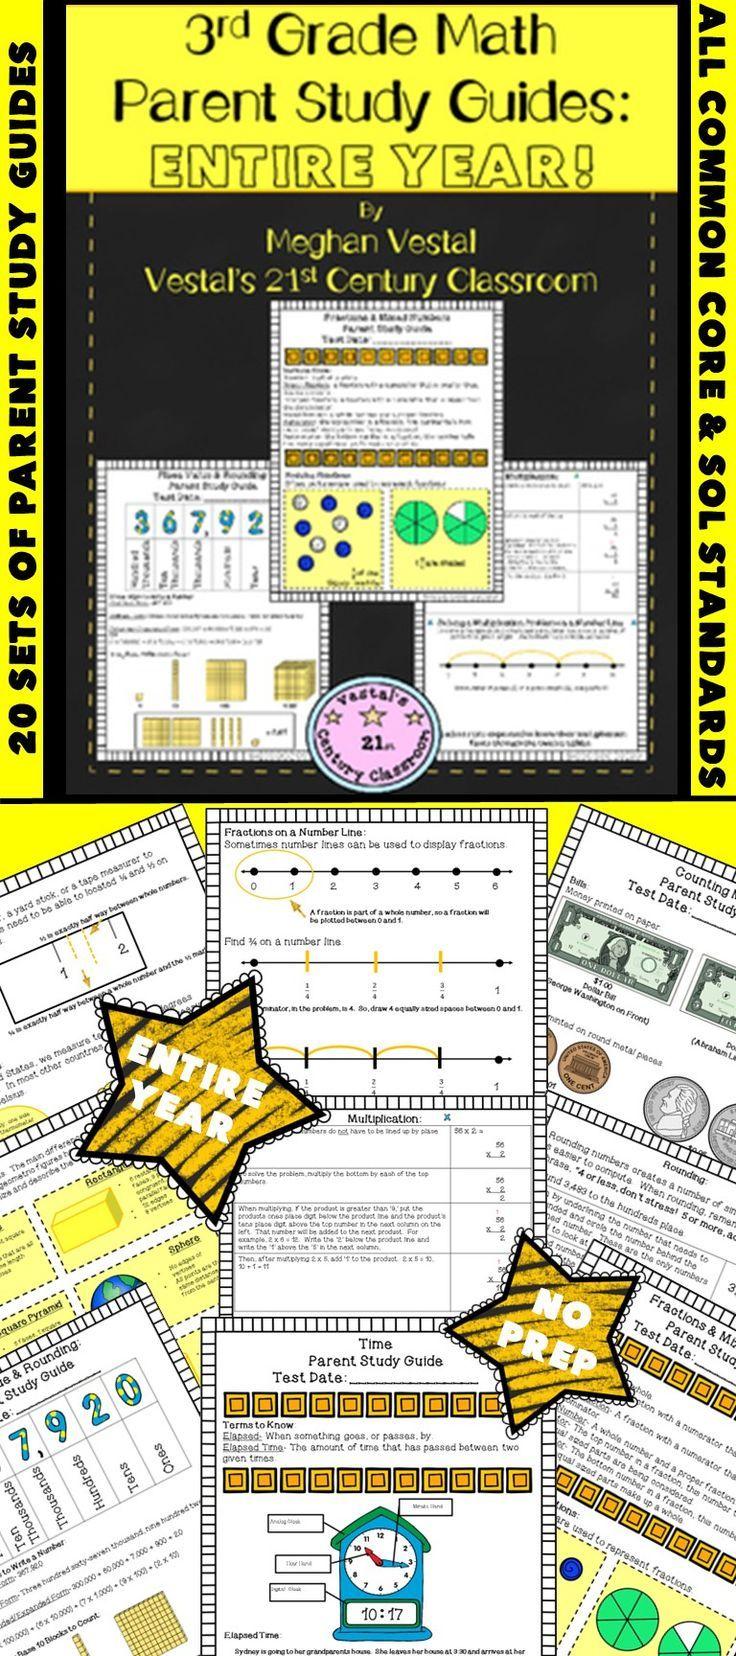 Elementary school math homework help